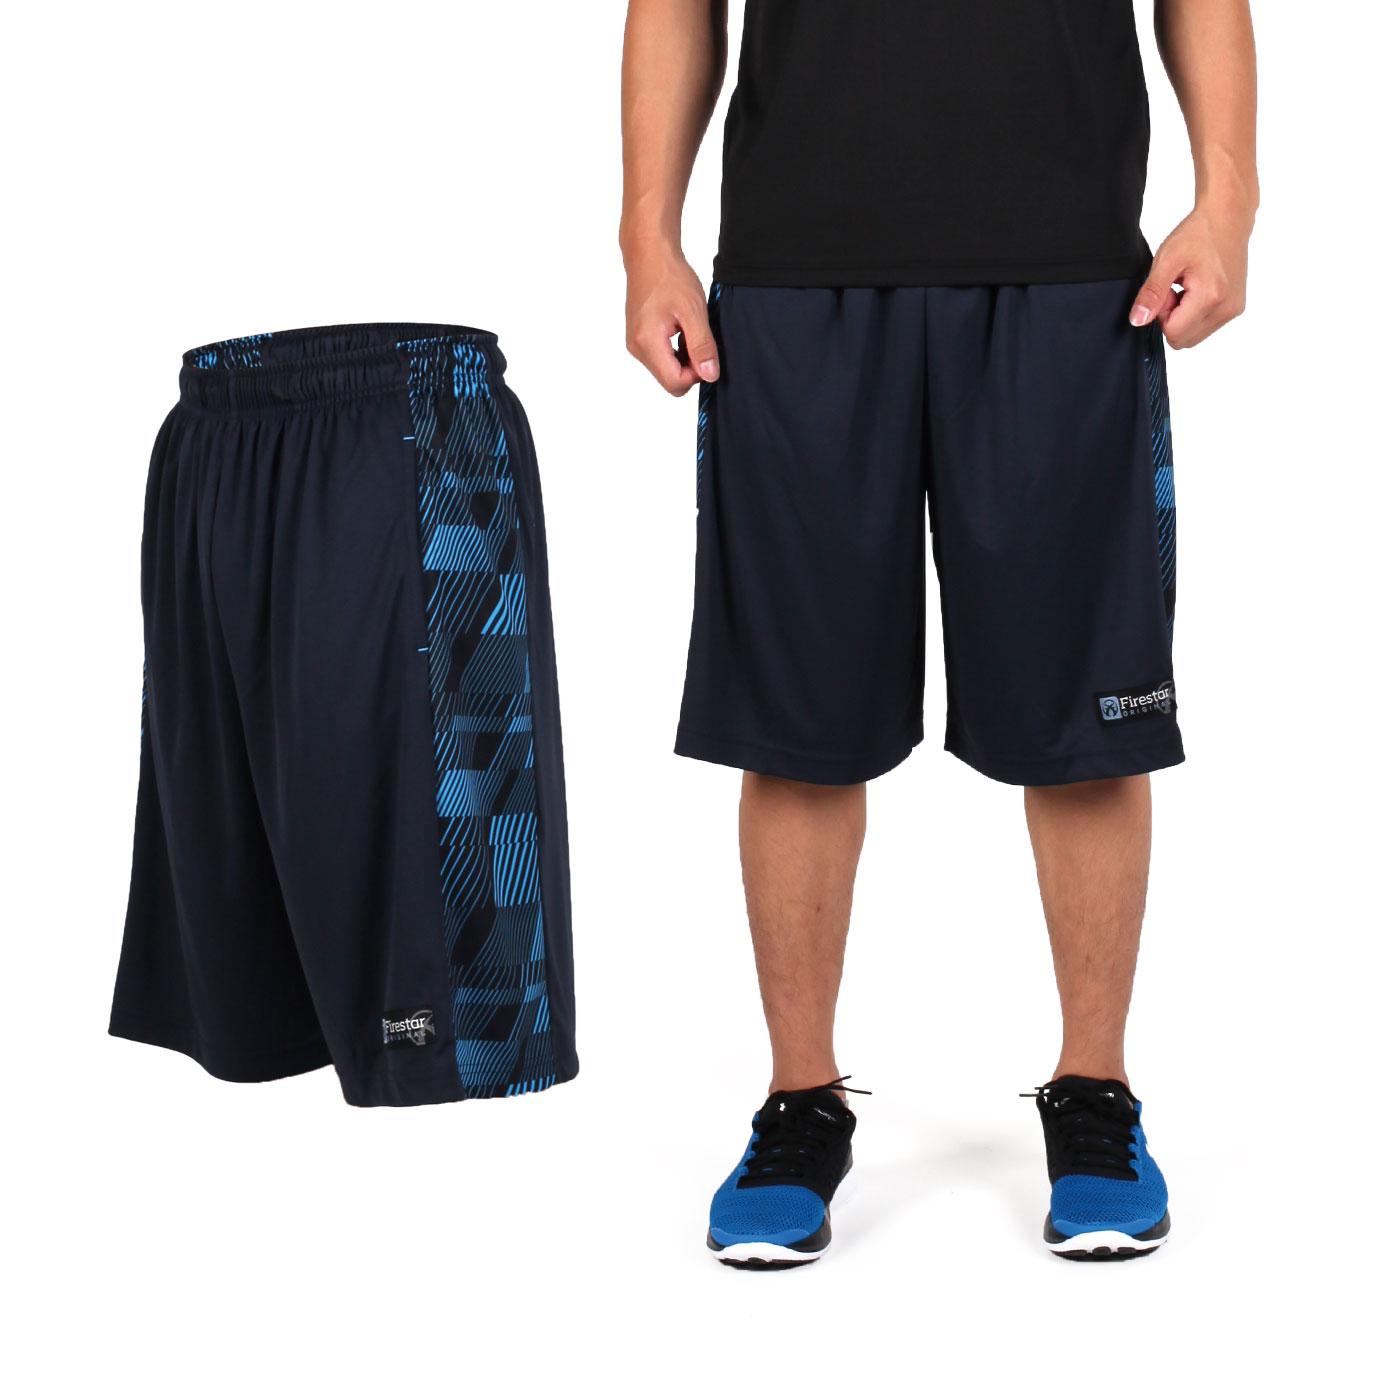 FIRESTAR 吸排籃球褲 B6303-10 - 丈青淺藍